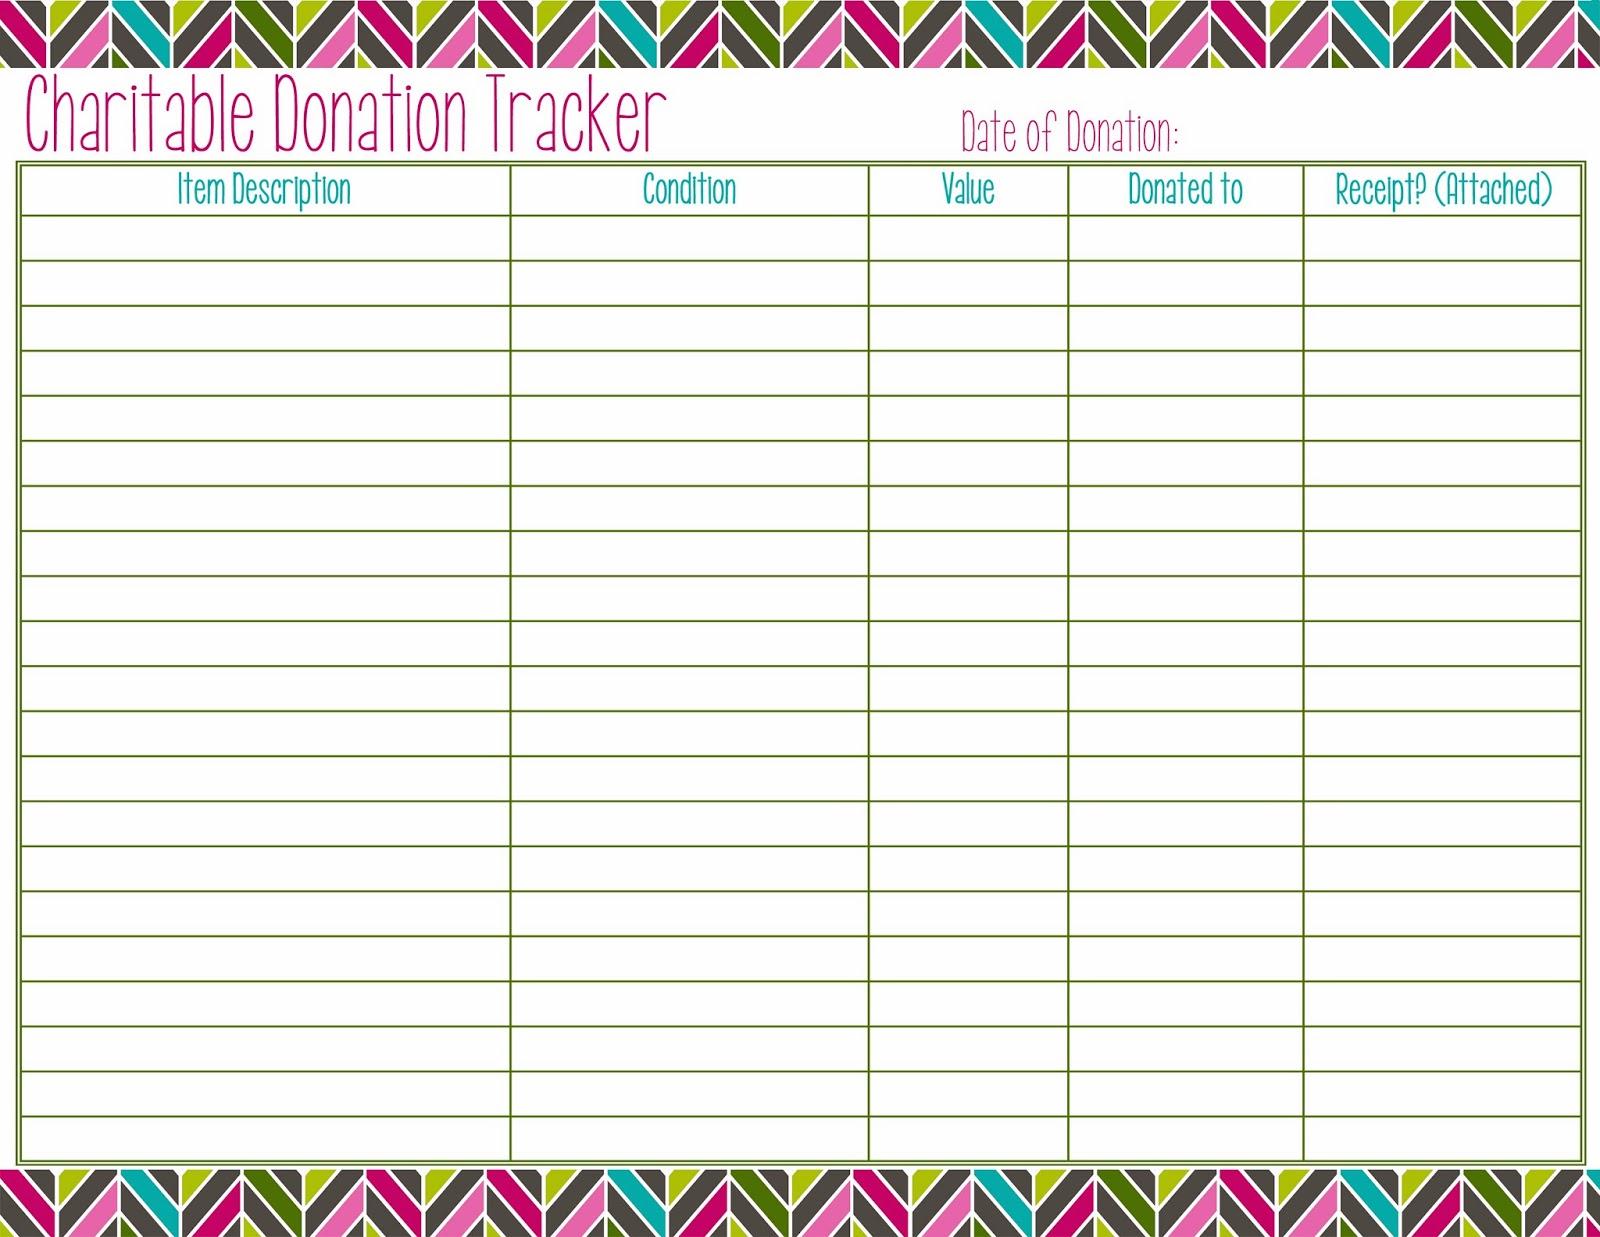 Miranda Bee Organize Your Move Charitable Donation Tracker